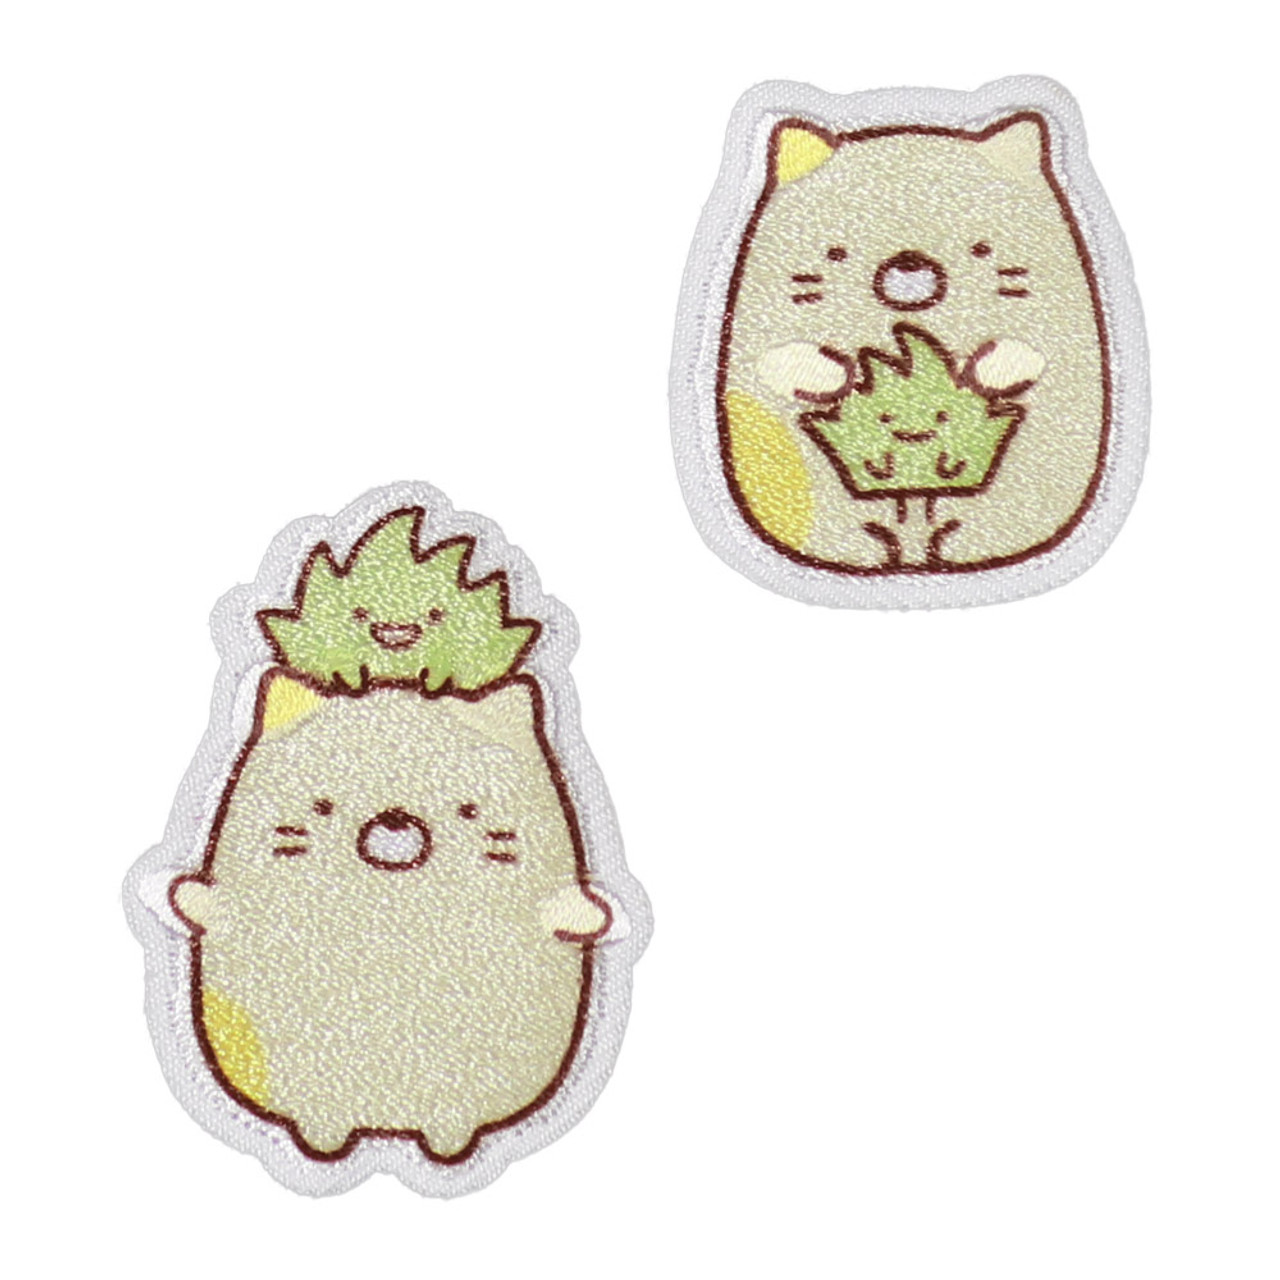 Sumikko Gurashi Iron On Patch Two Neko Cat PSU138 ( Front View )